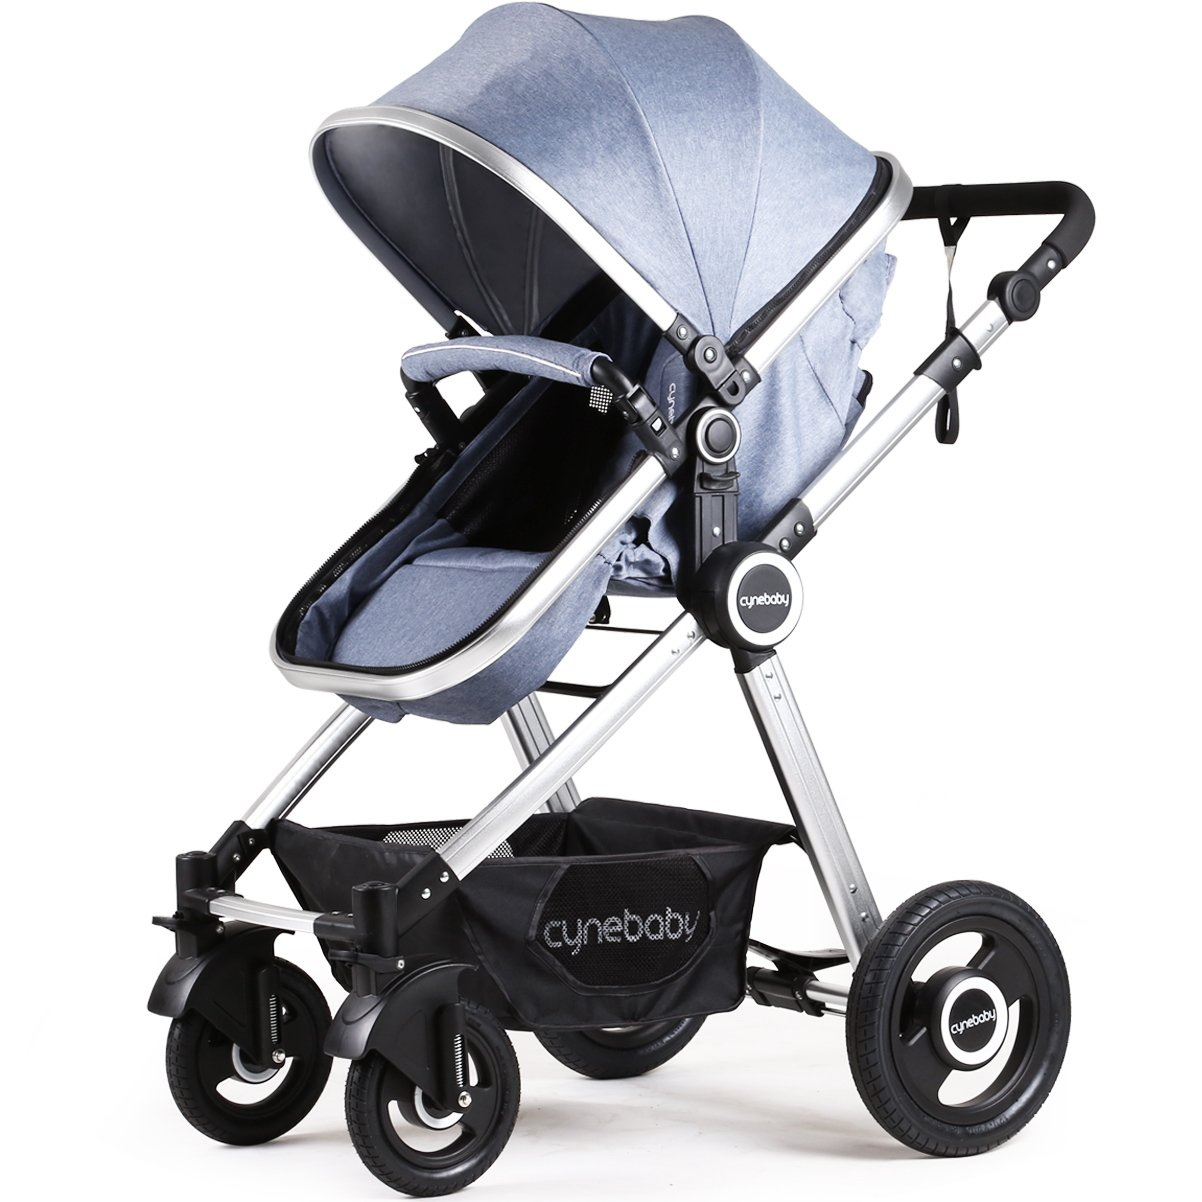 Amazon.com: Cochecito de bebé recién nacido, cochecito de ...